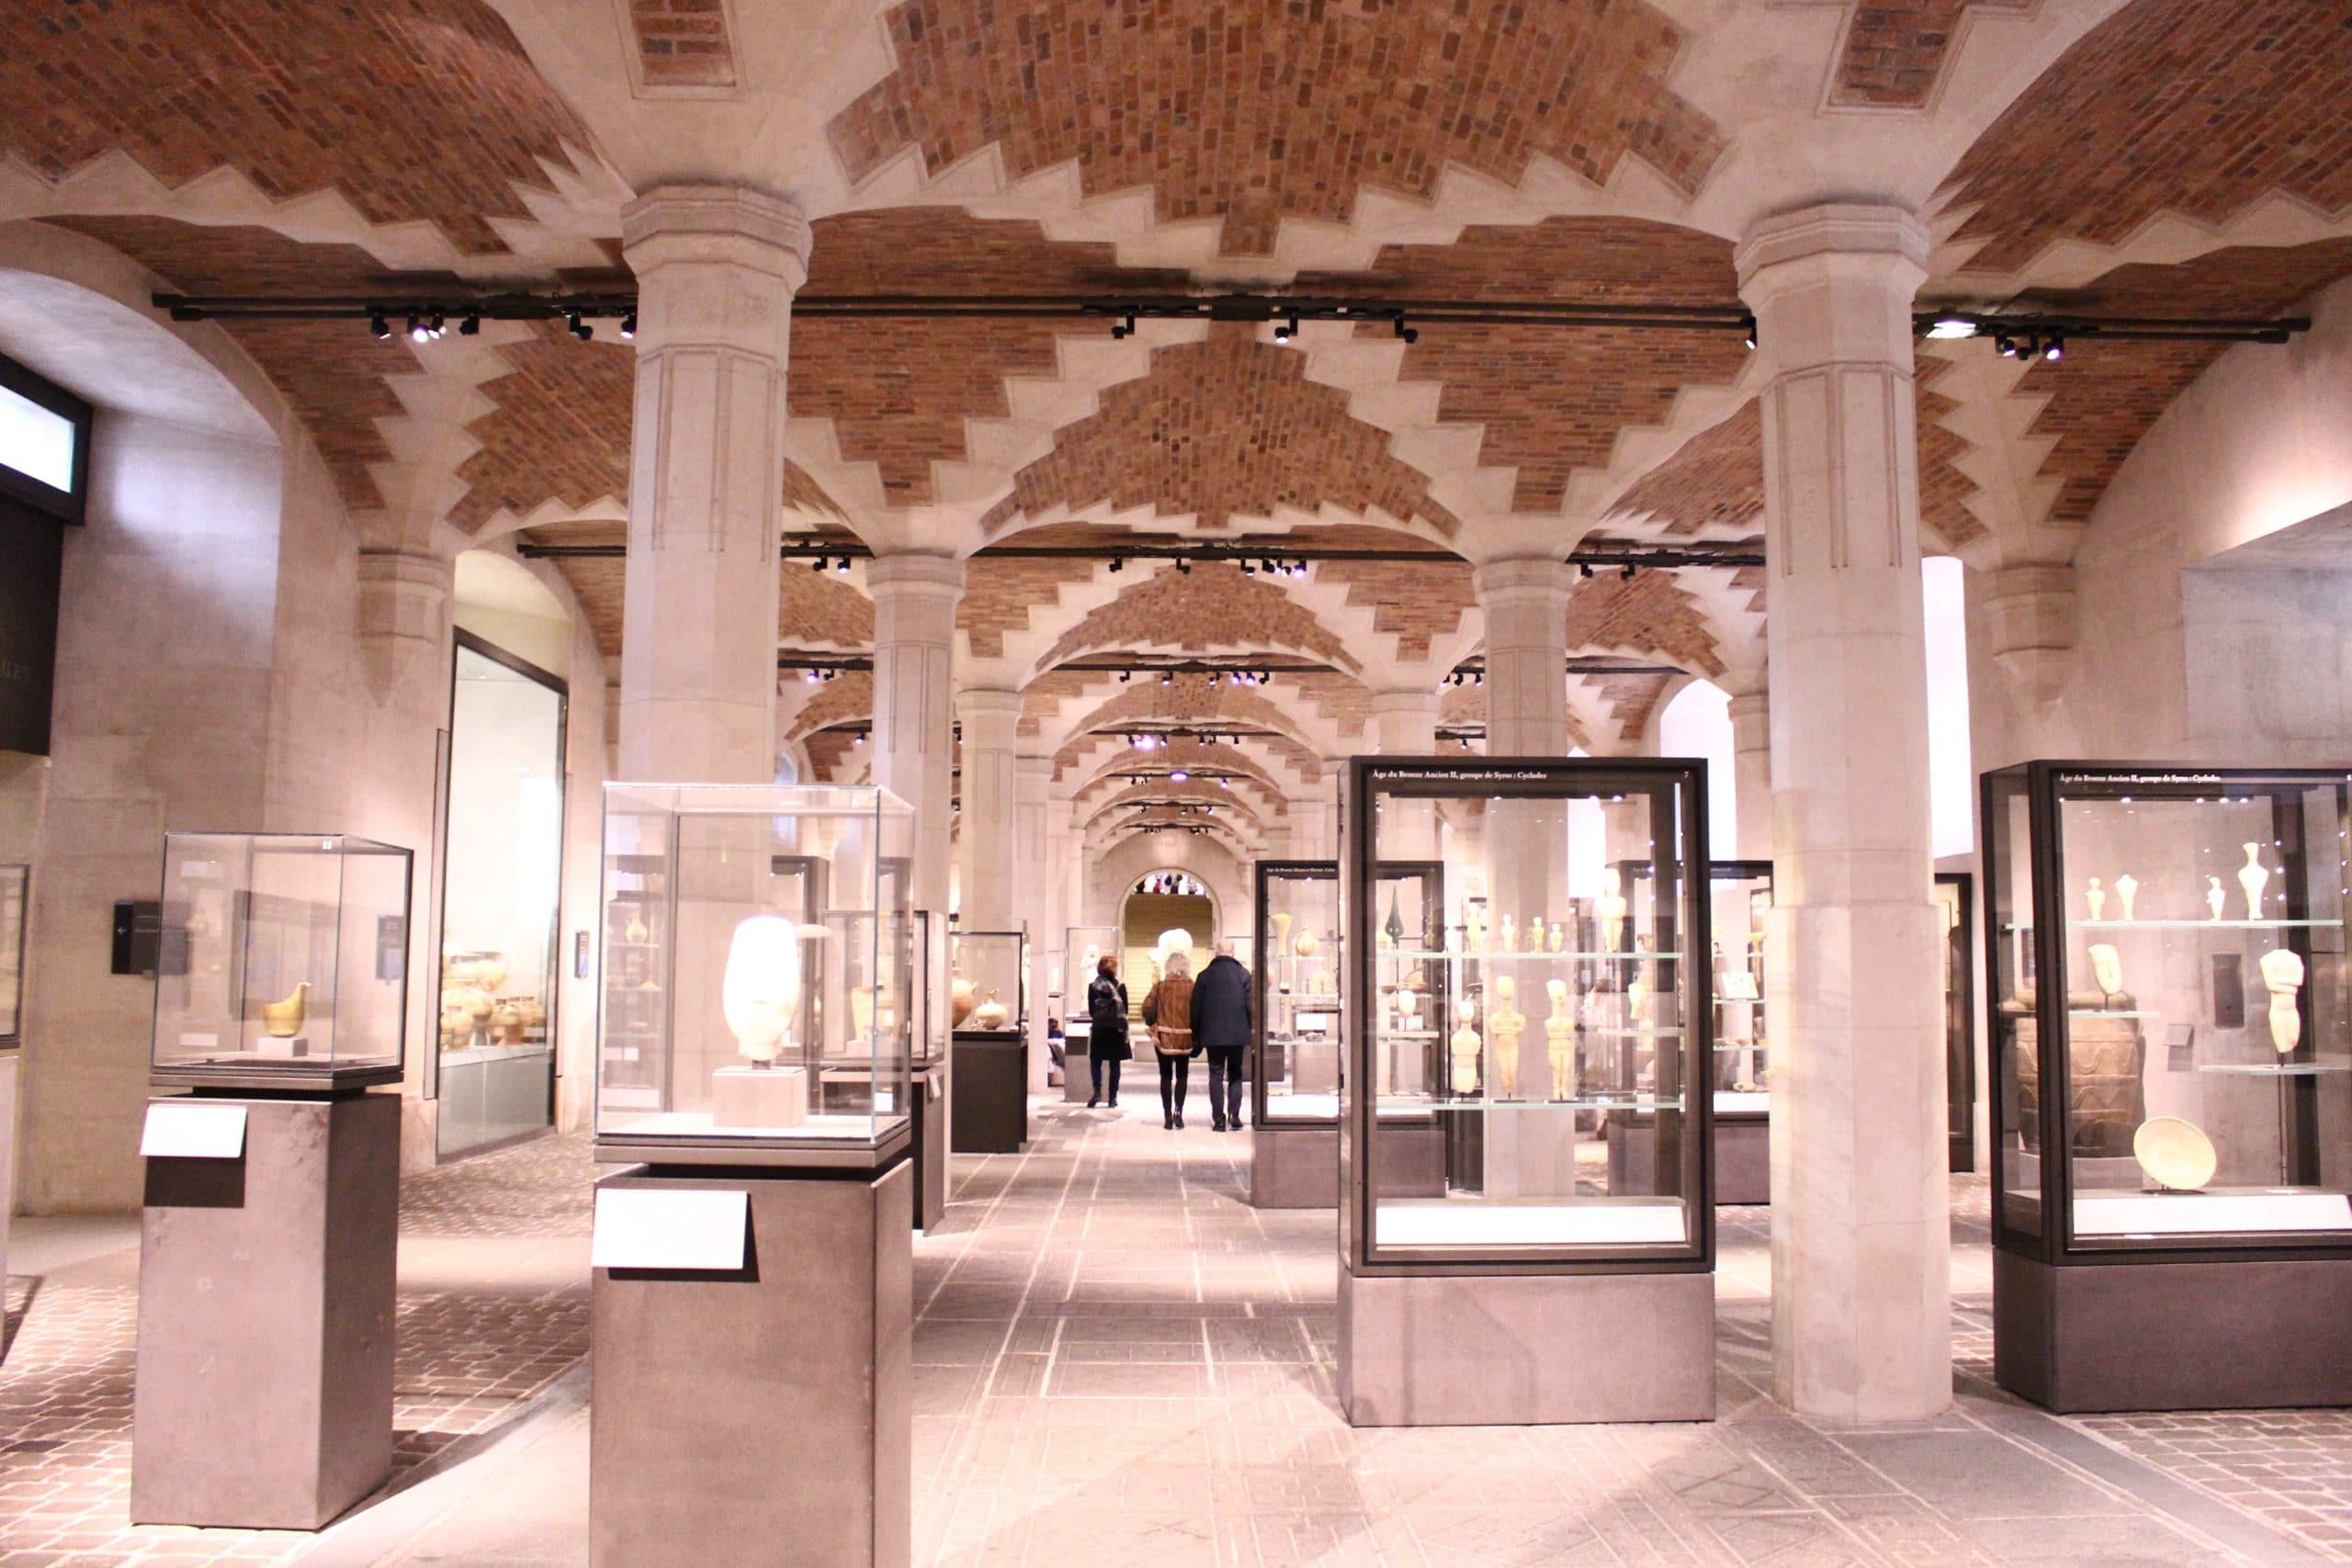 Sculpture 5 - Louvre